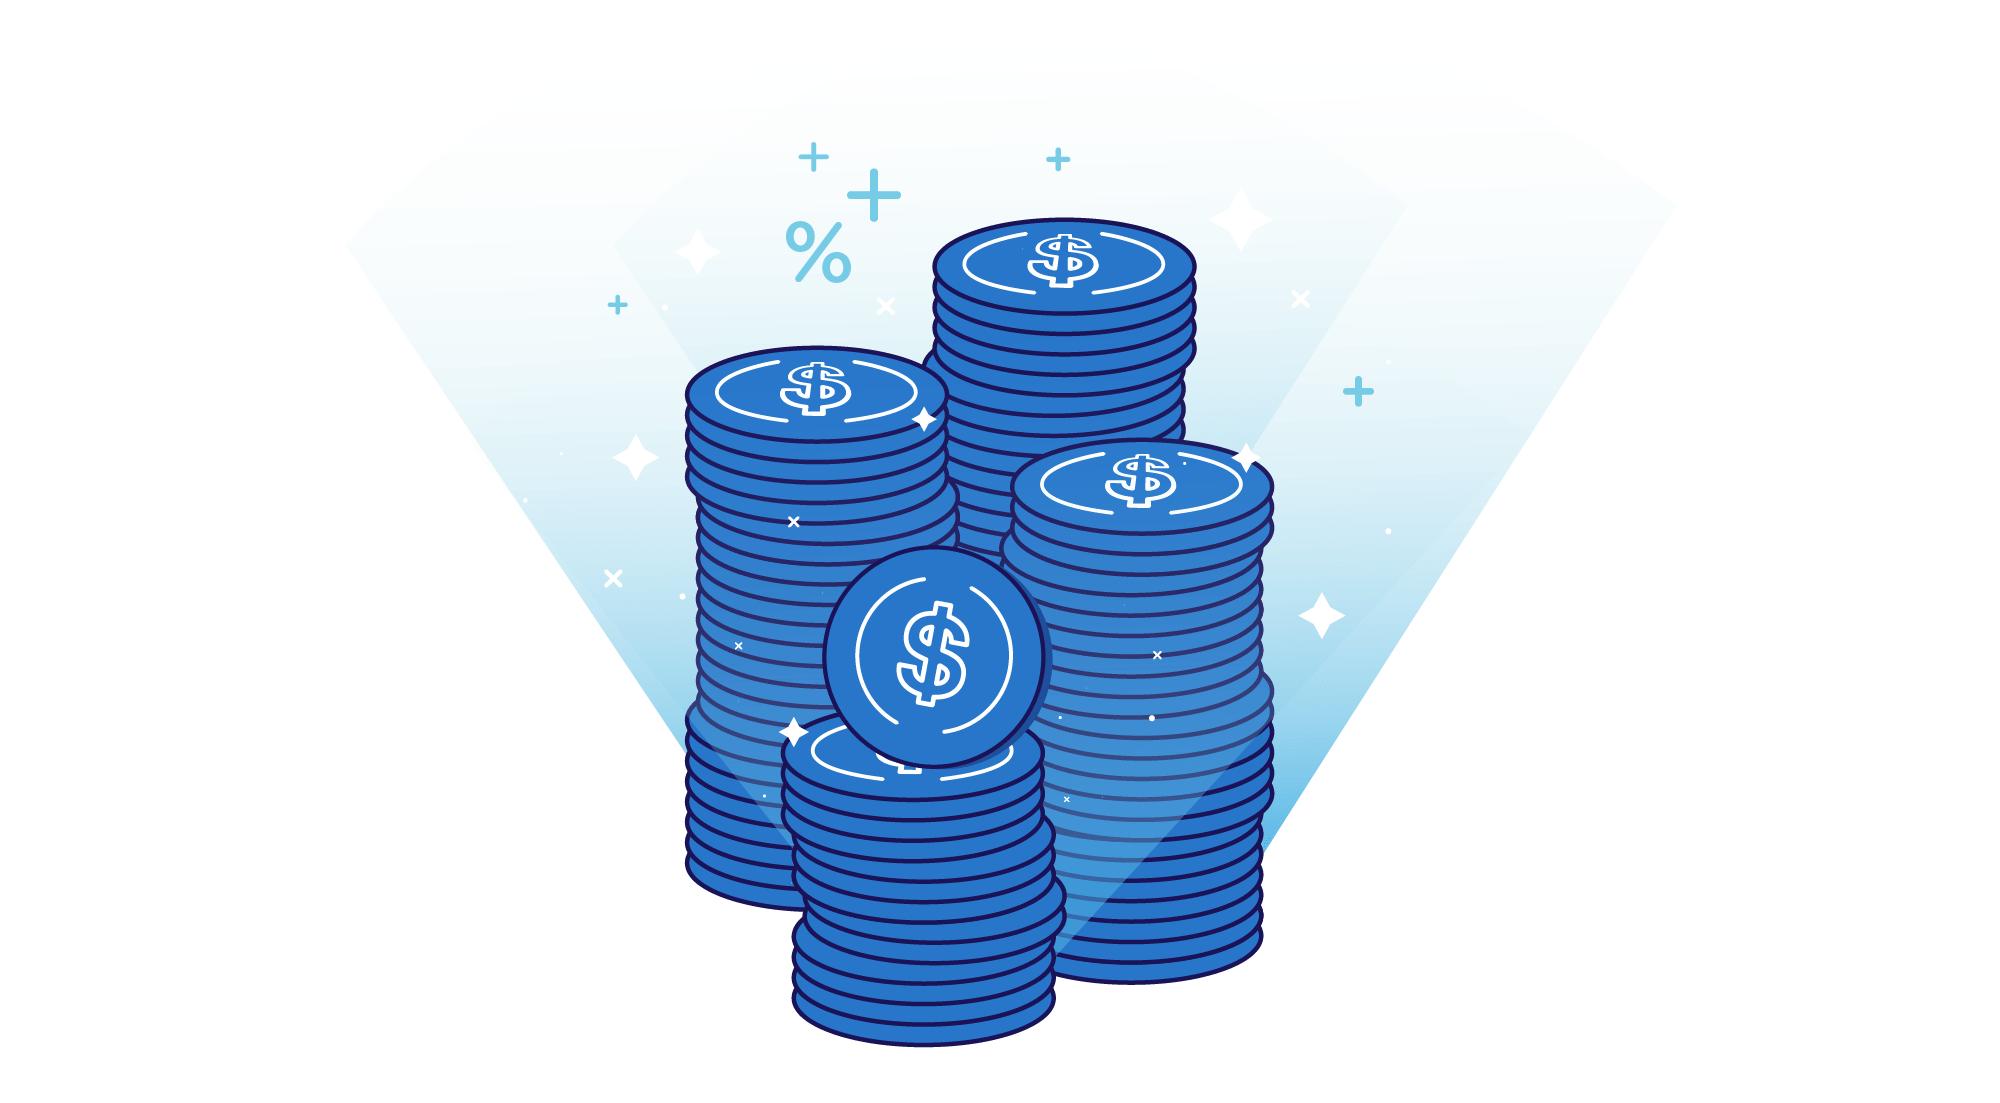 Ripio Earn te permite generar ganancias con tus stablecoins